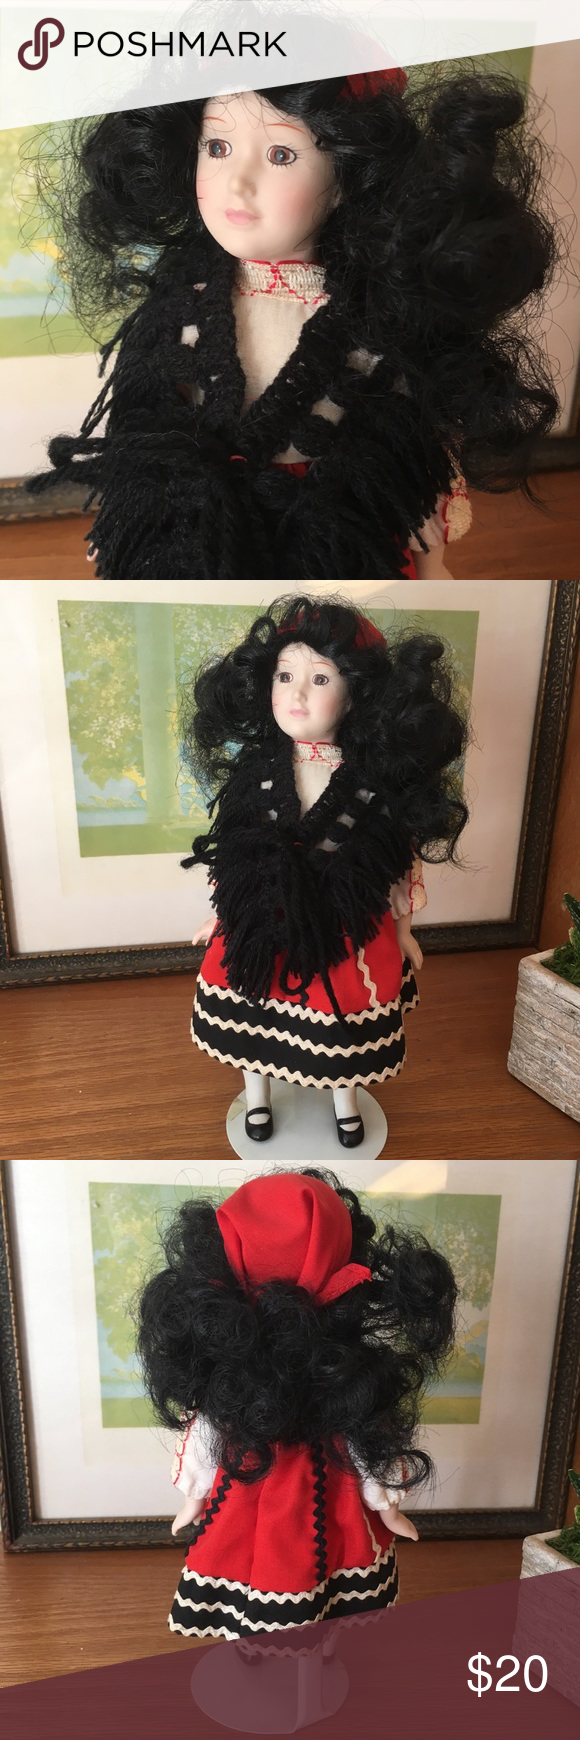 "Danbury Mint Bride Doll Rosa of Portugal 9"" Danbury Mint Bride Doll ""Rosa of Portugal"" doll. Very good vintage condition. Vintage Accents Decor #bridedolls"